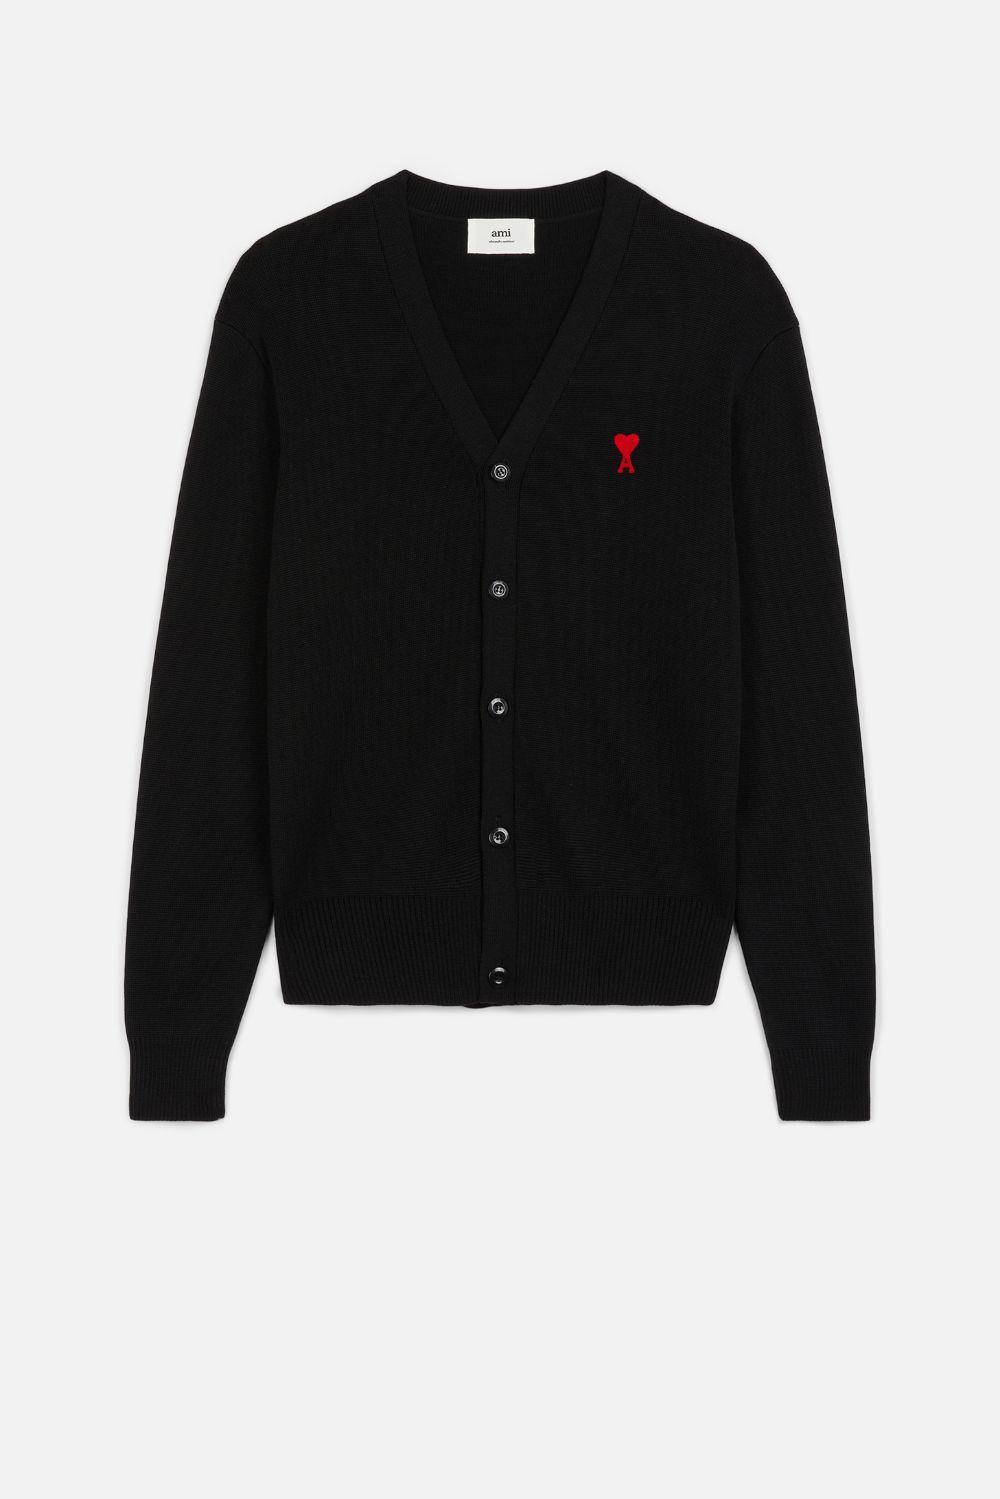 Ami de coeur cardigan Black in Wool Man AMI - ALEXANDRE MATTIUSSI | Sweaters | BFHK305.001001